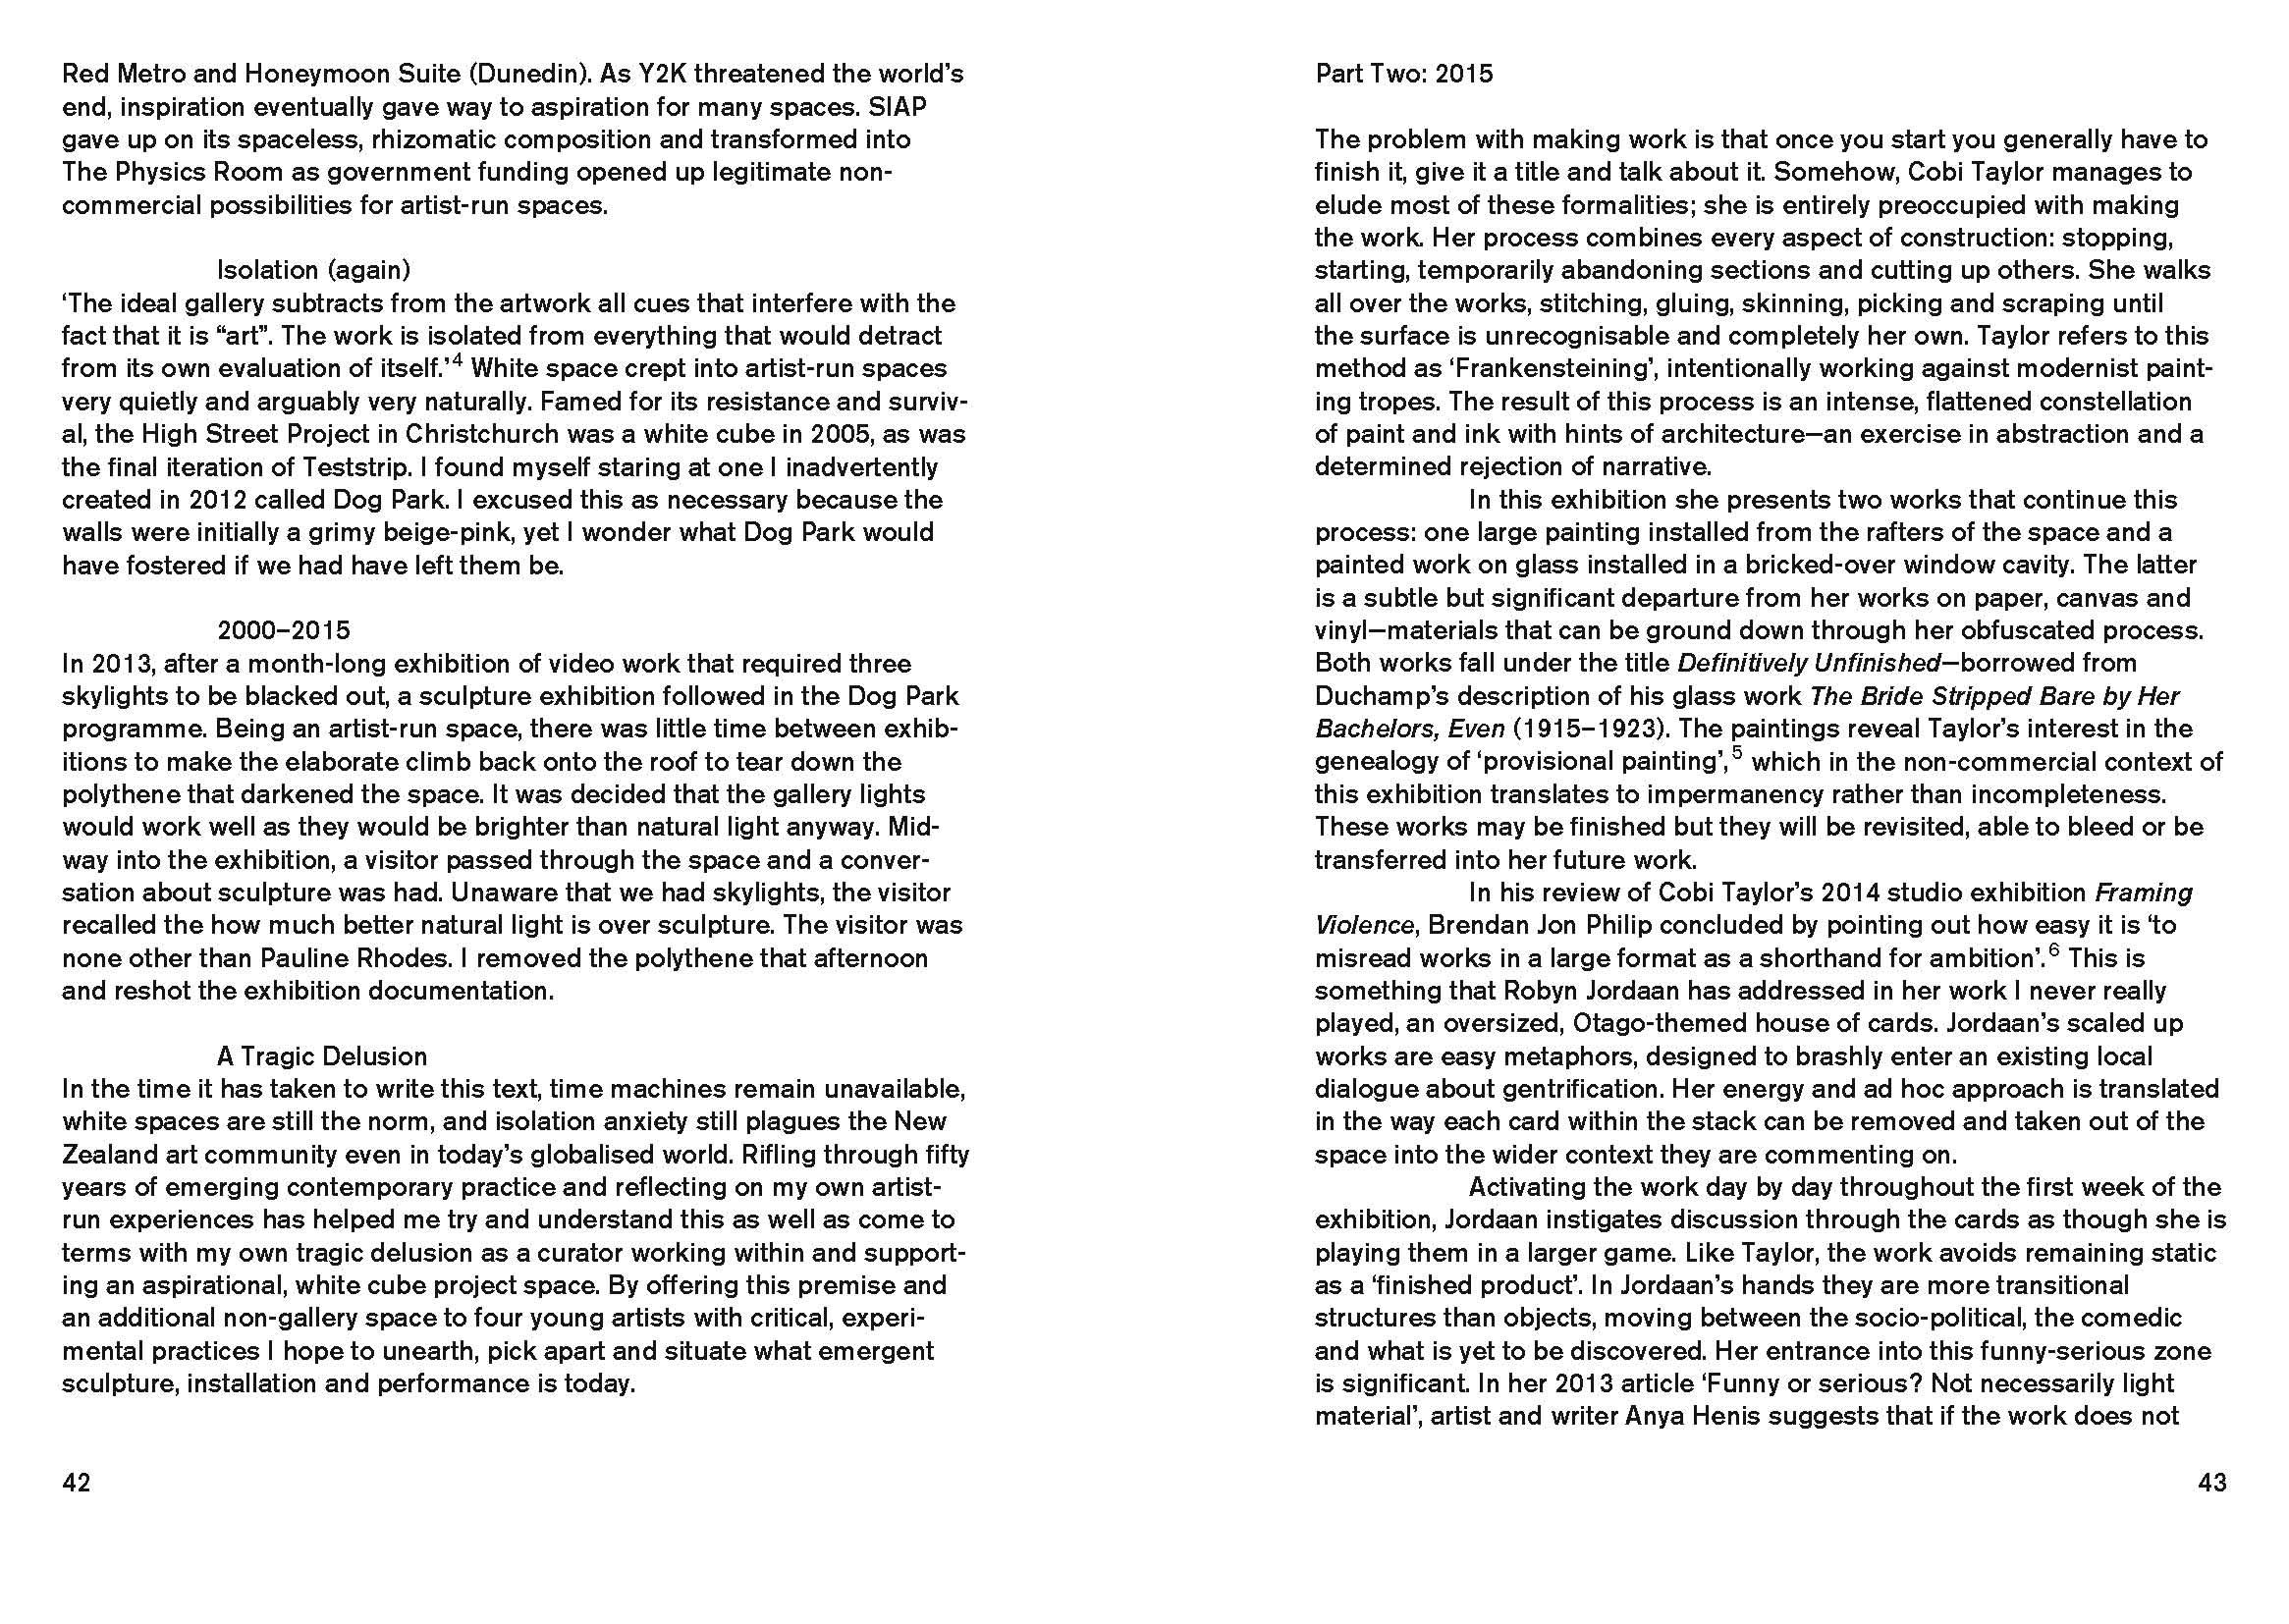 A Tragic Delusion Exhibition Essay_Page_2.jpg